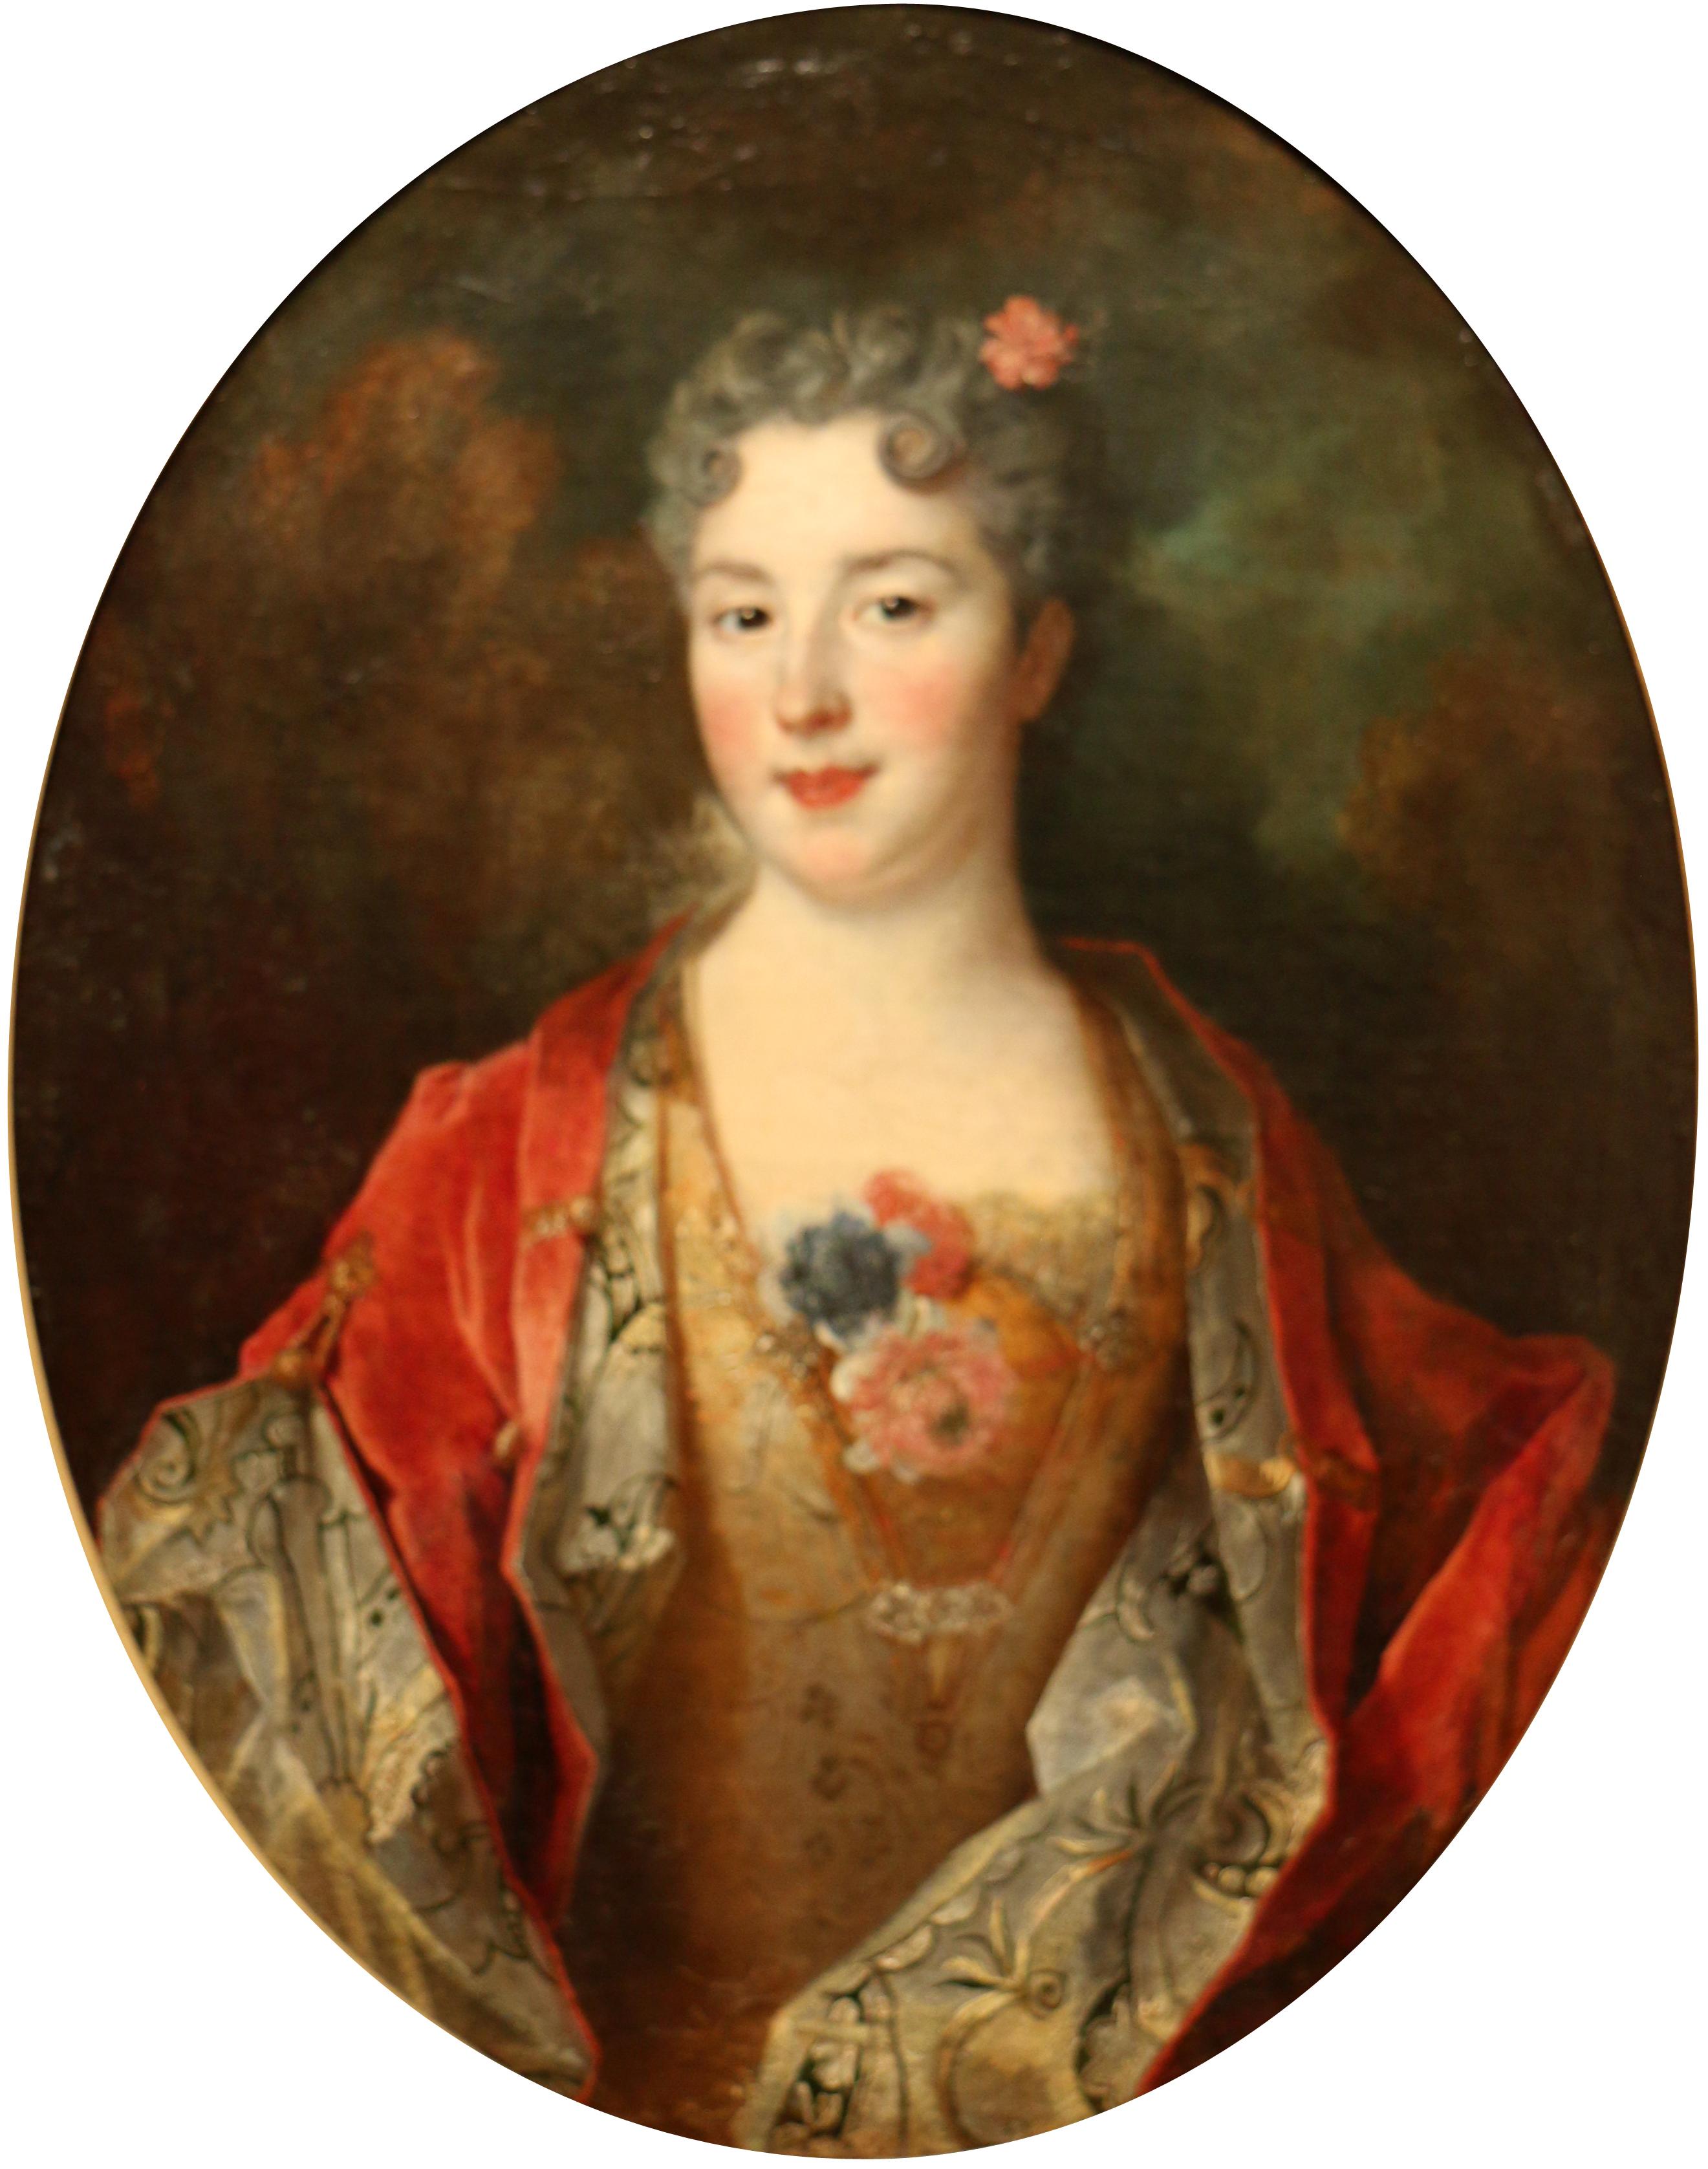 file nicolas de largilli re portrait de femme en wikimedia commons. Black Bedroom Furniture Sets. Home Design Ideas